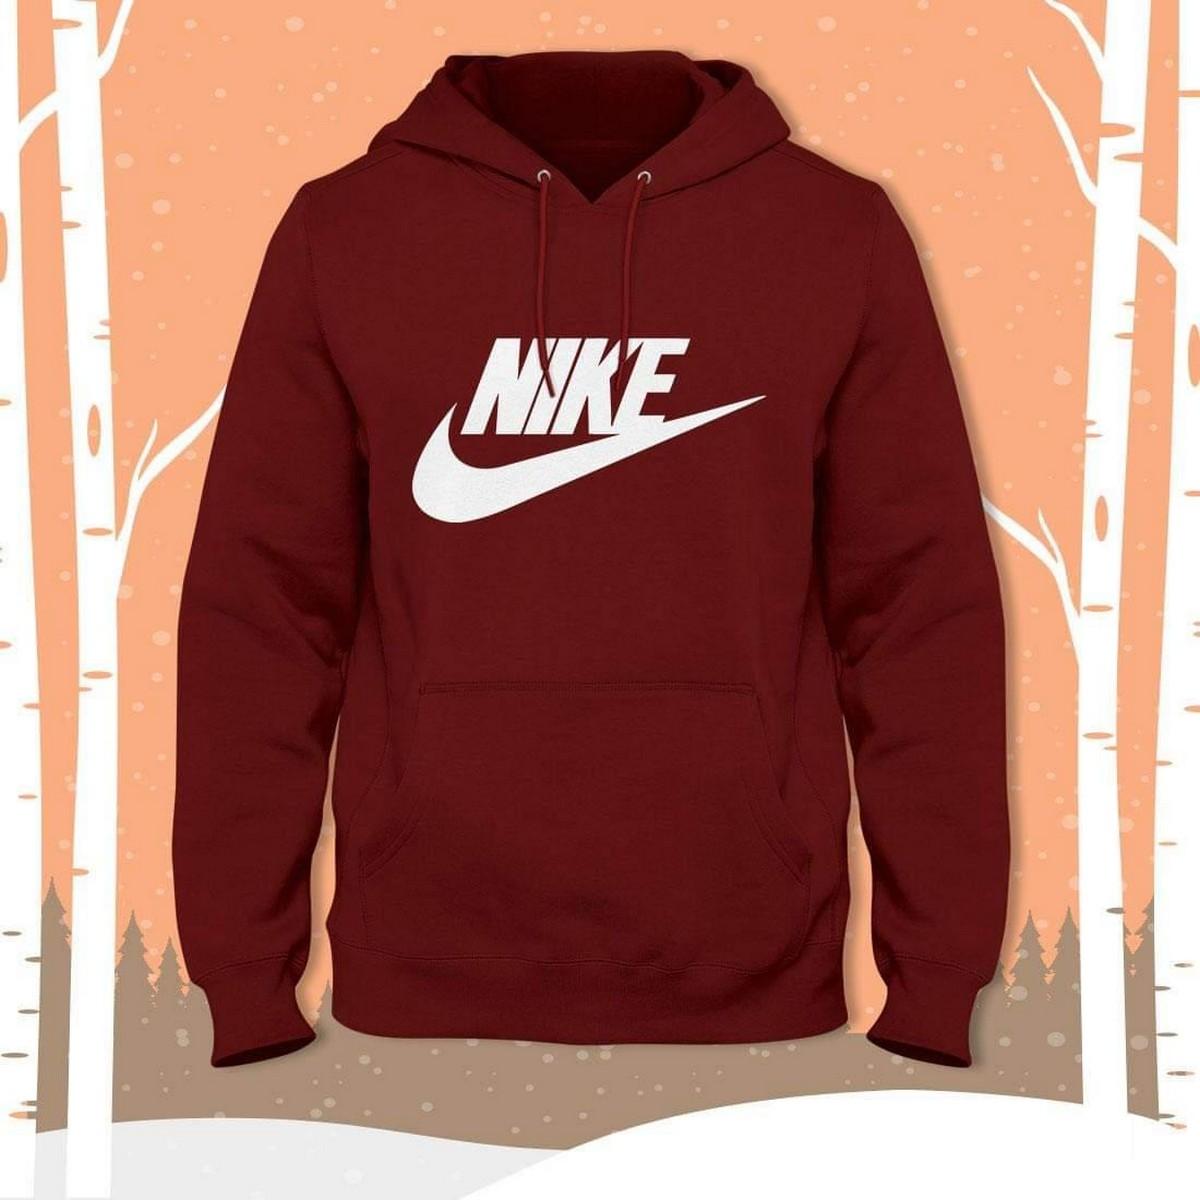 Winter Sweatshirt Fleece Hoodie Sweat Shirt O-Neck Full Sleeves Tee Shirt Round Neck TShirt Casual Tshirt For Men & Women